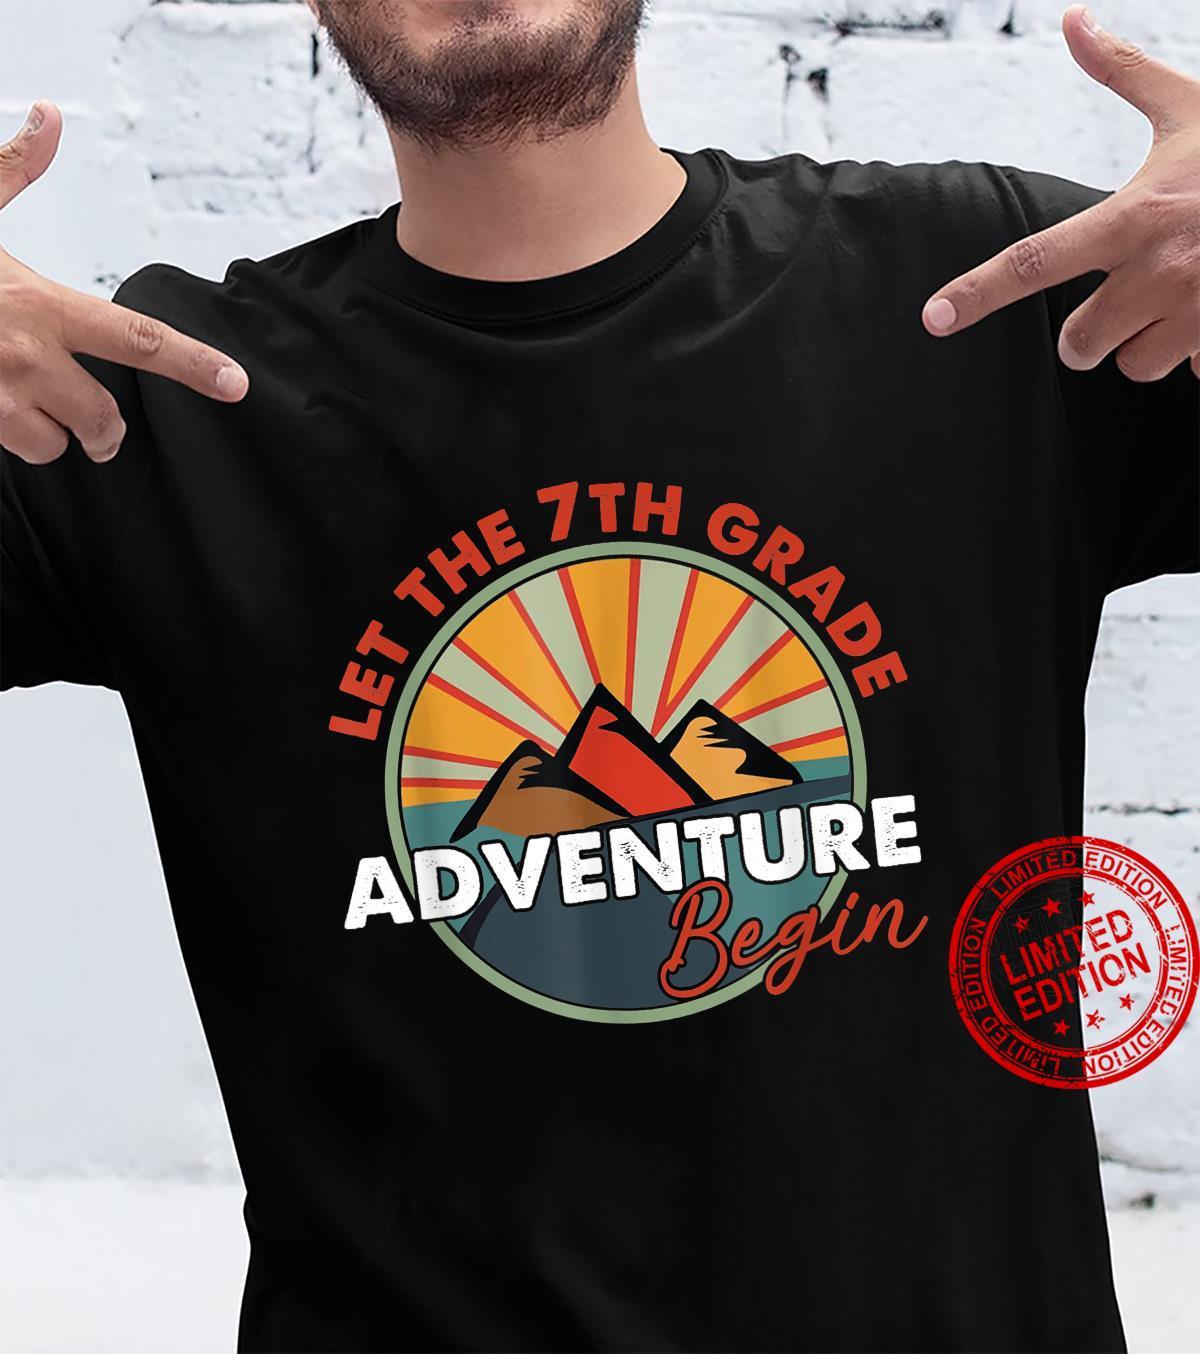 Let the 7thgrade Adventure begin Shirt